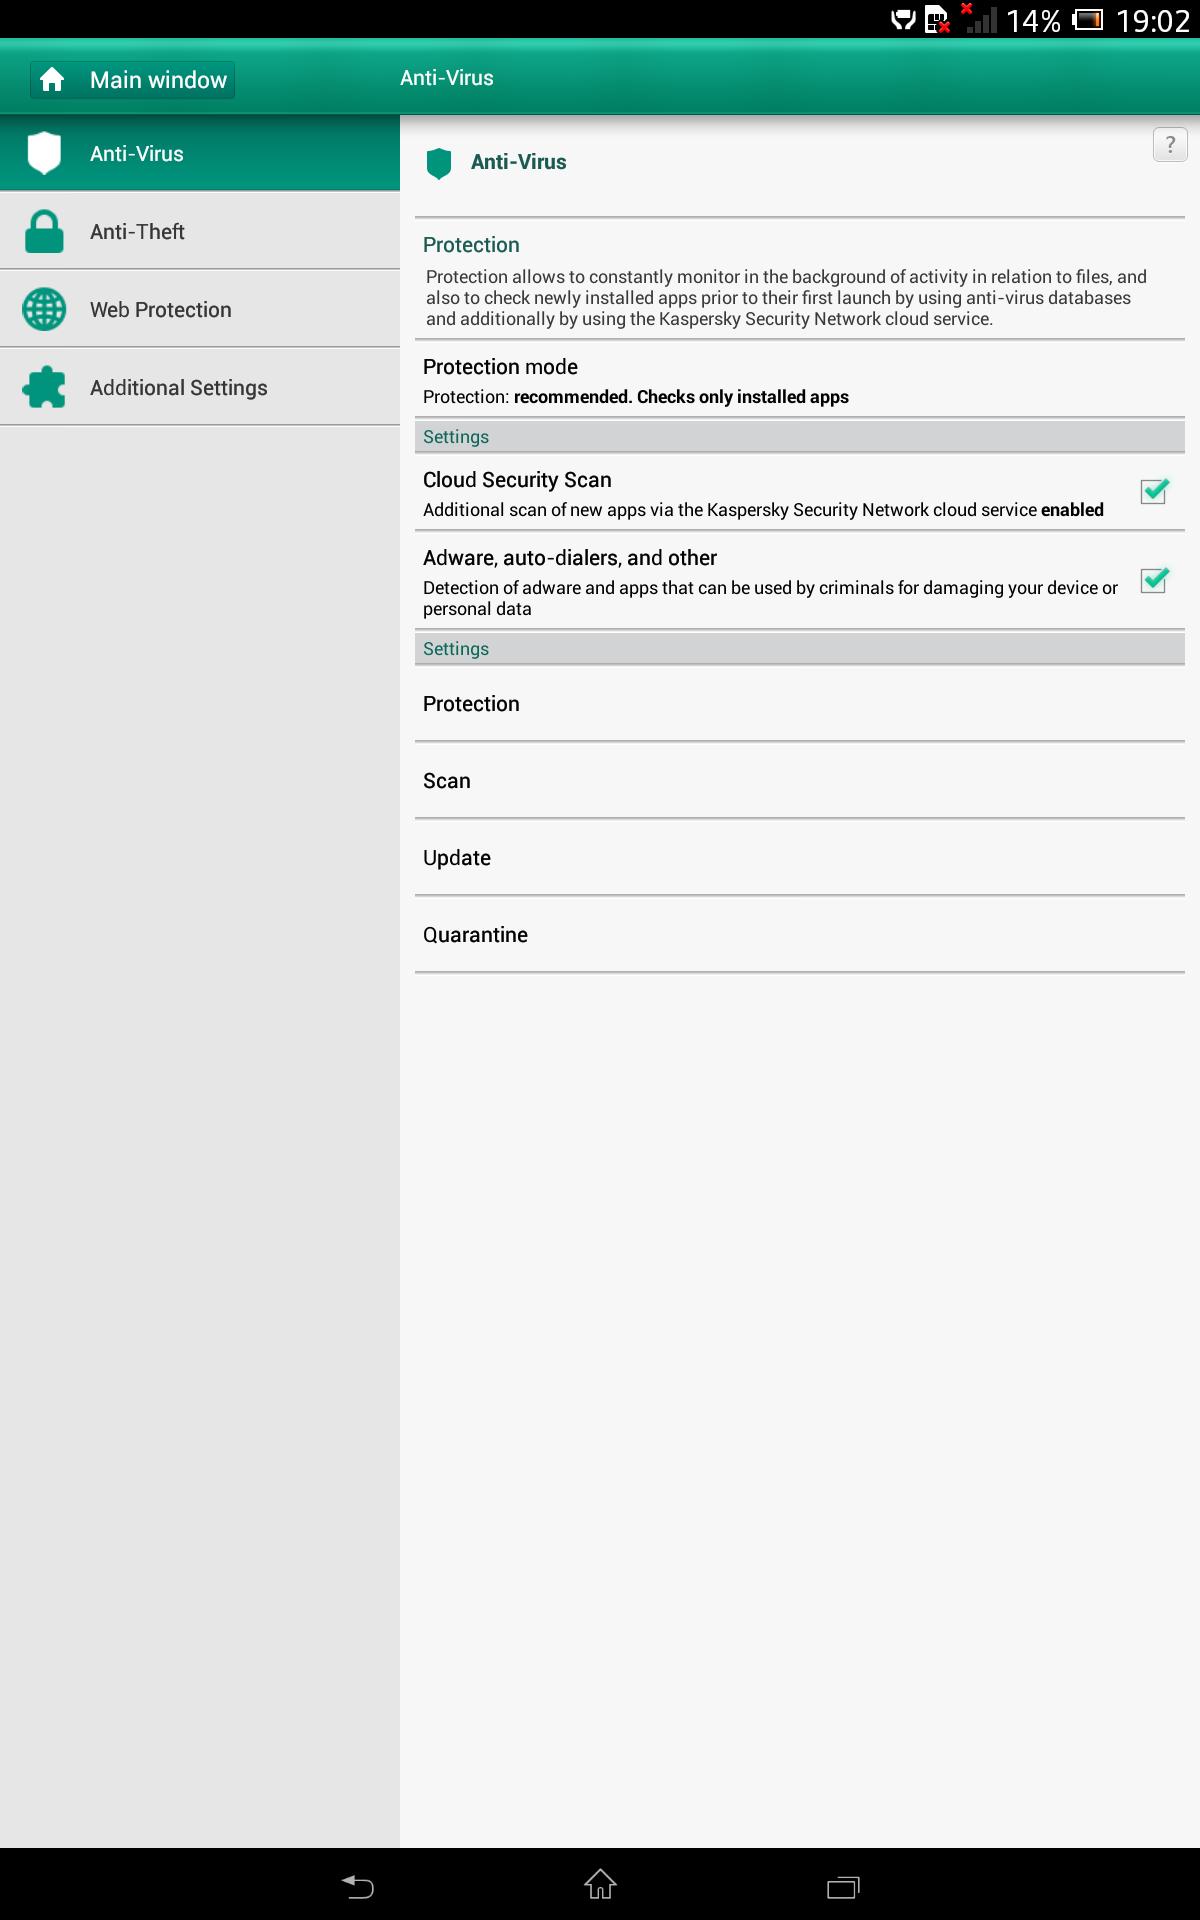 Sony Xpera Z tablet Screenshot 7